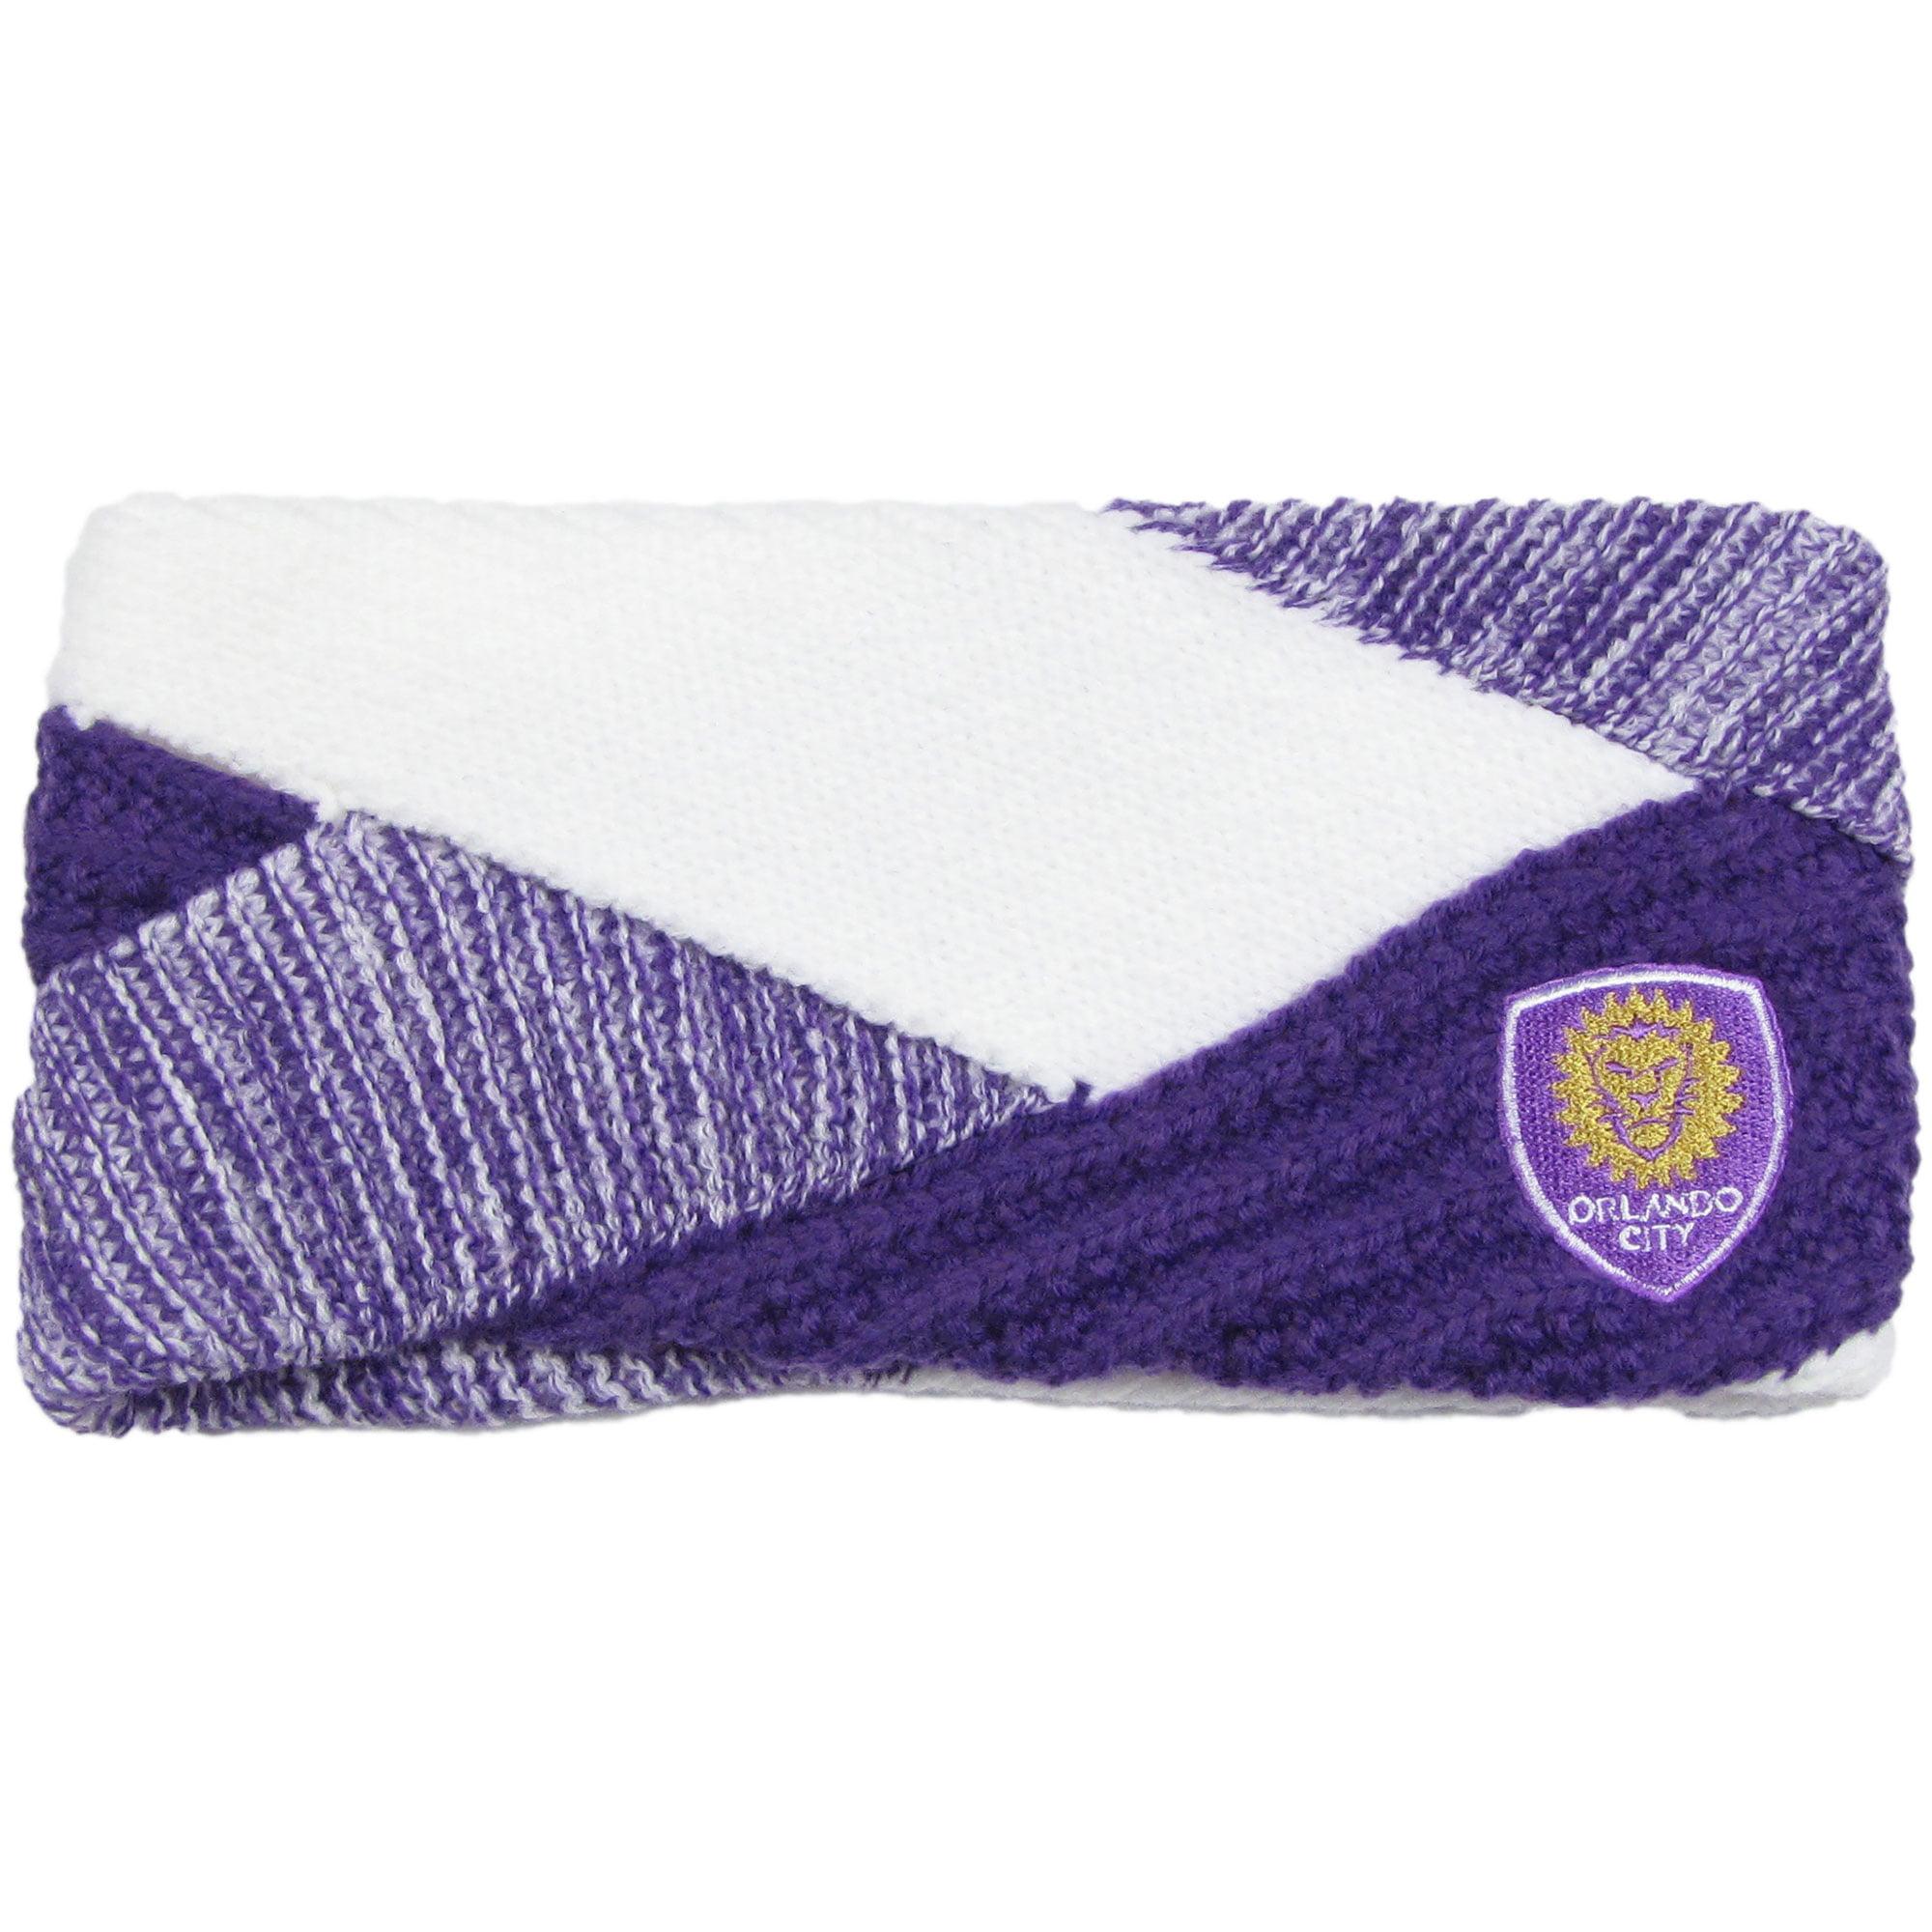 Orlando City SC ZooZatz Women's Criss Cross Headband - Purple/White - No Size